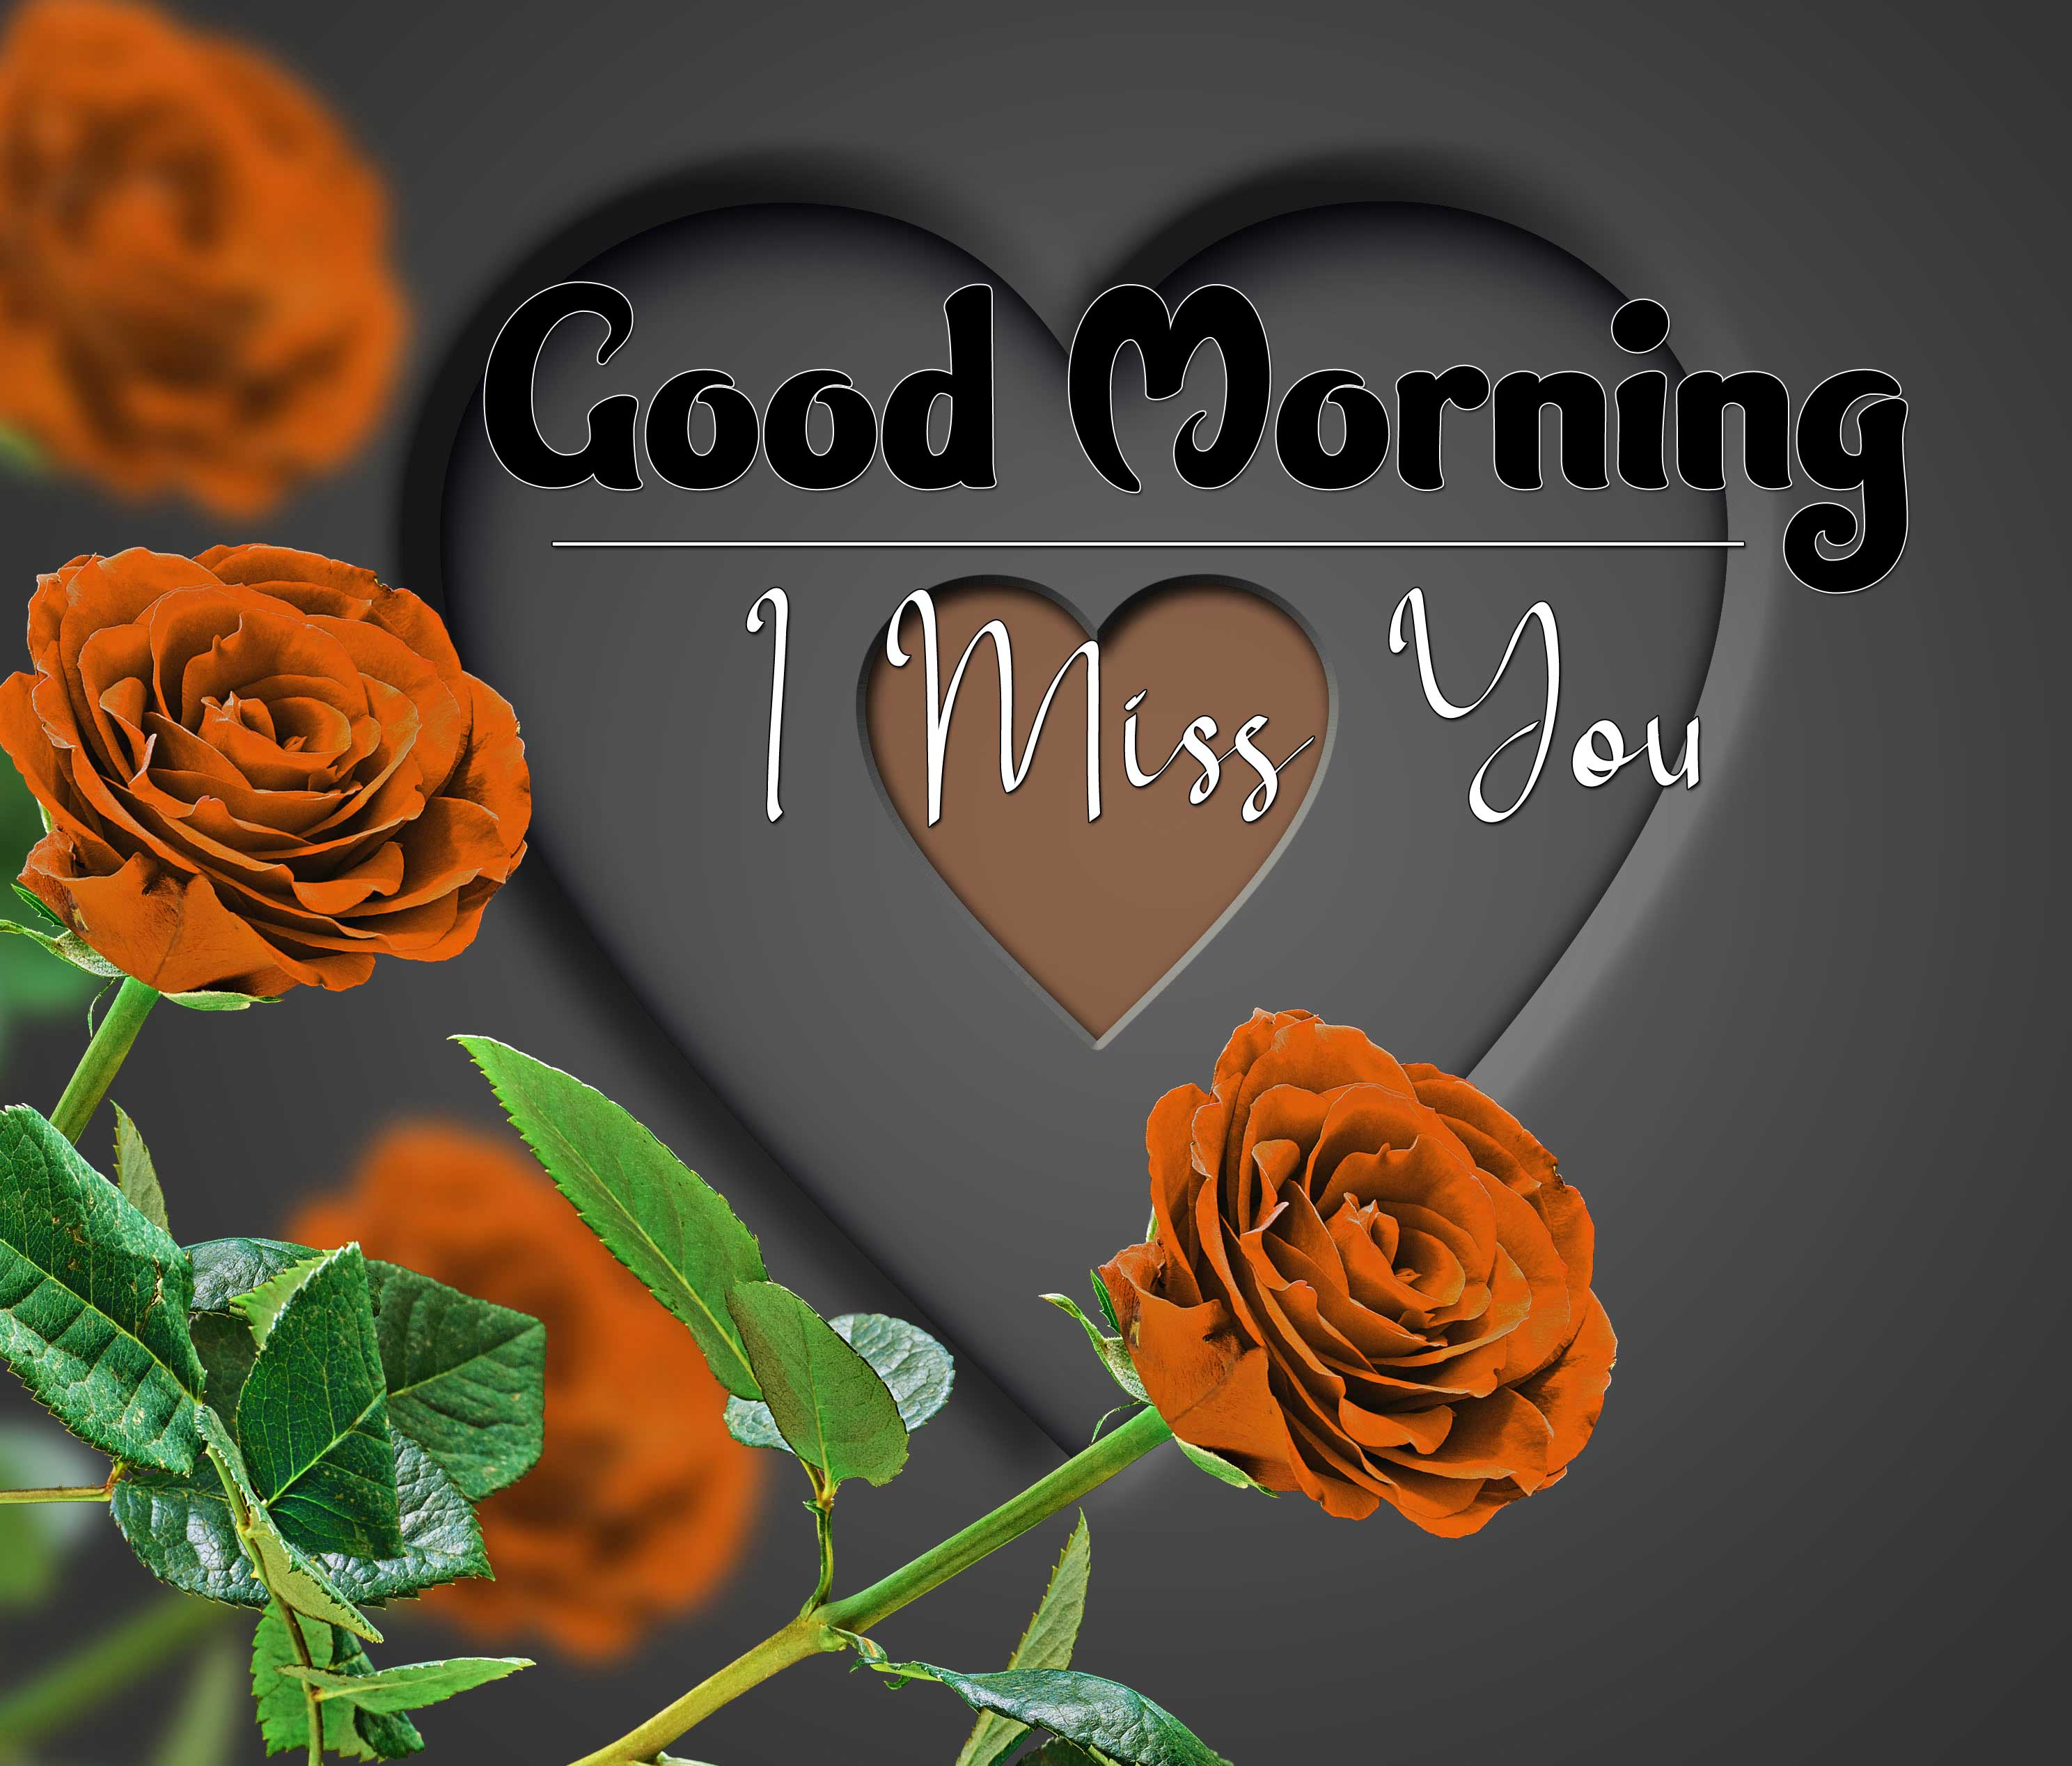 beautiful rose good morning images photo free hd